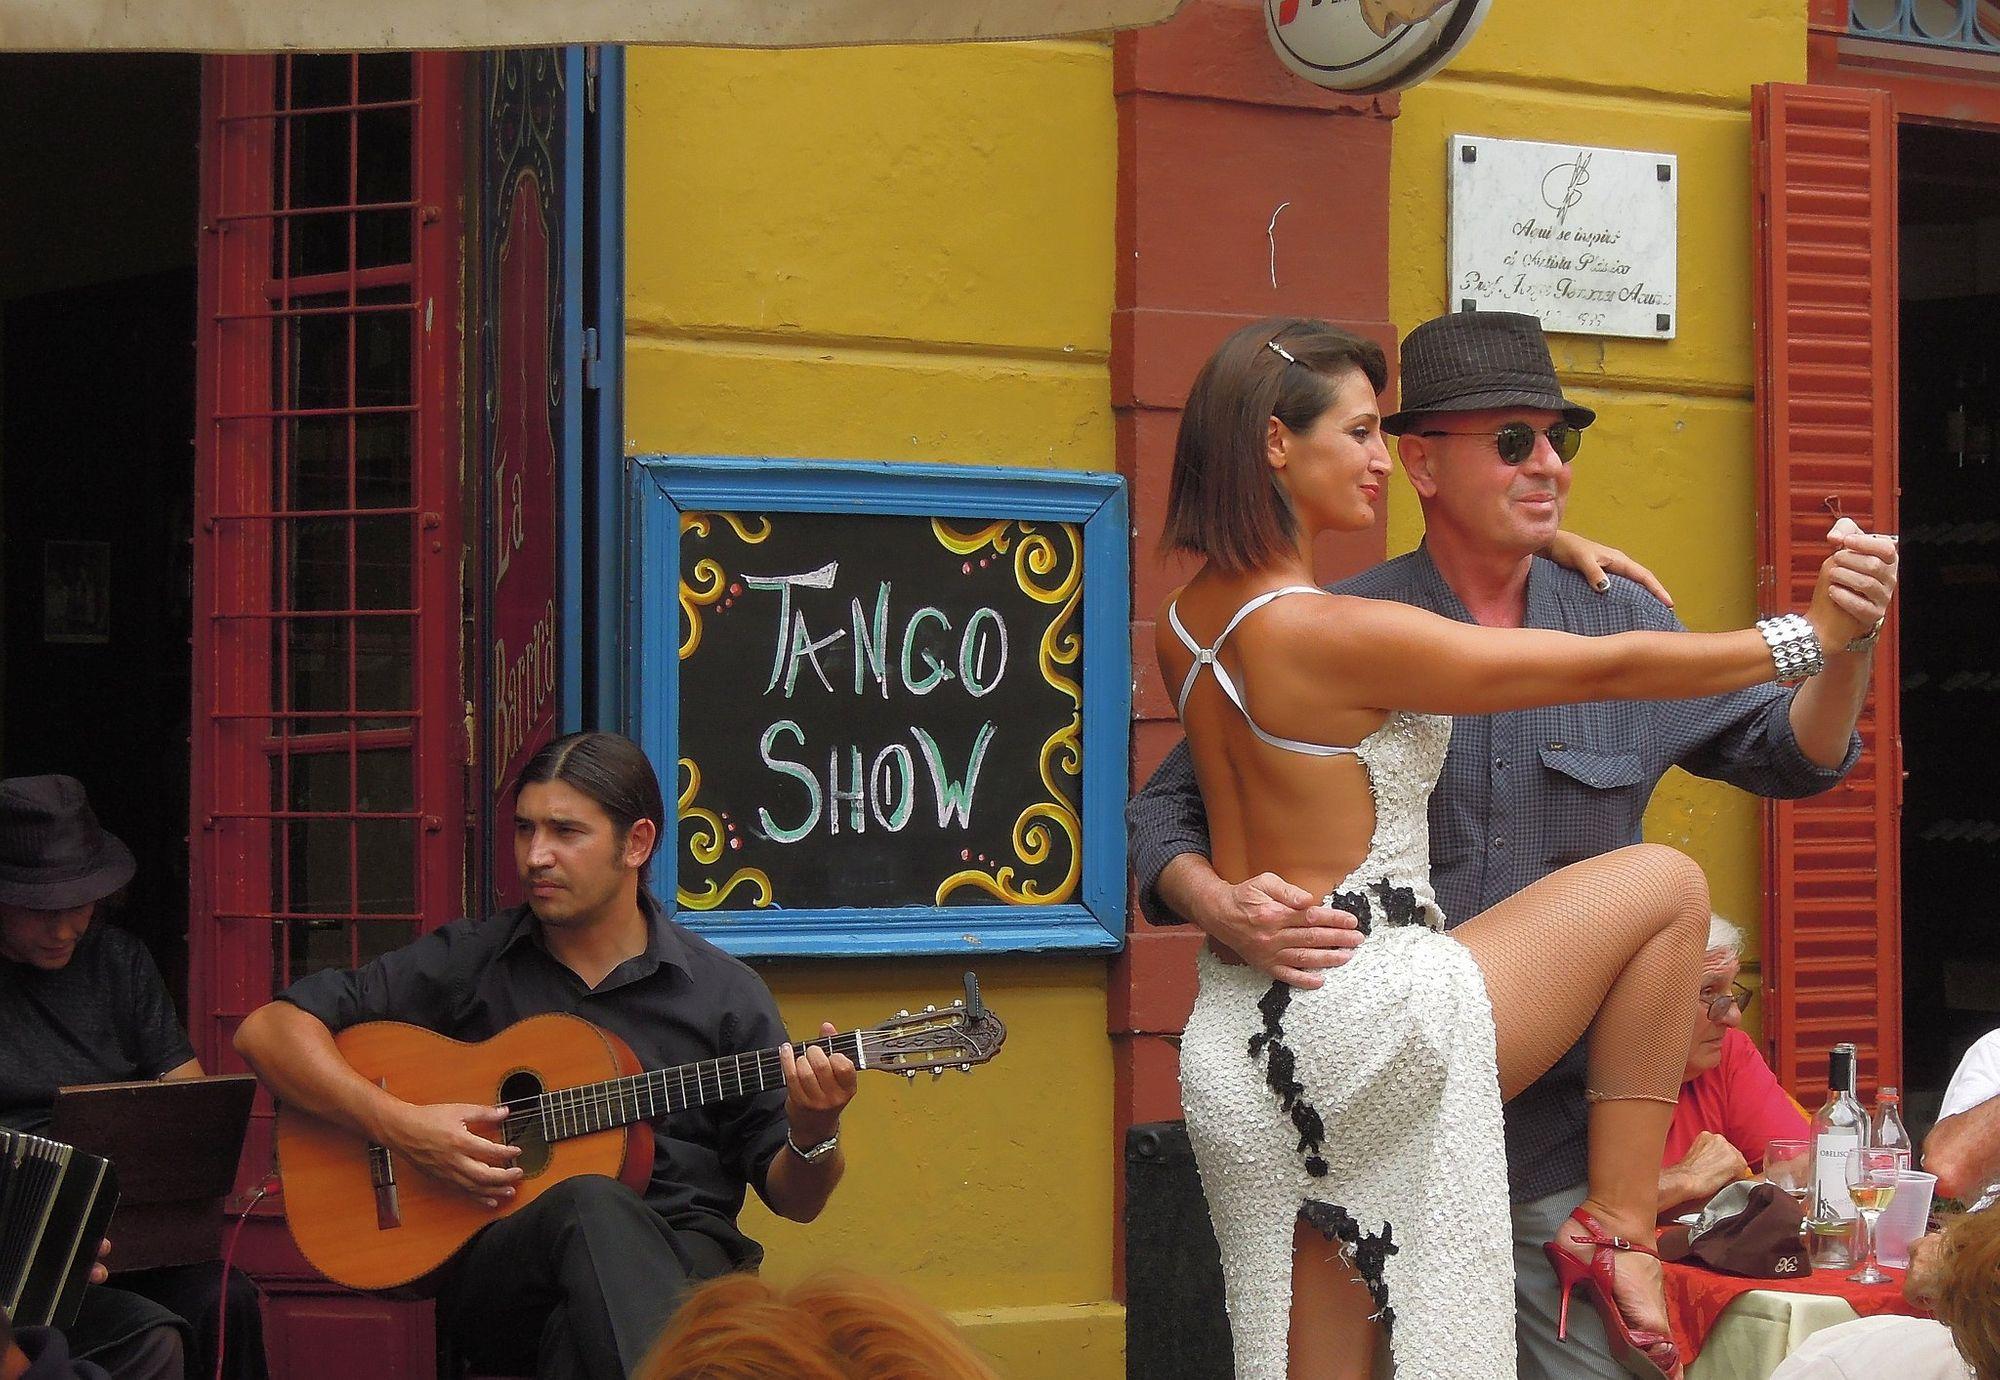 Argentina (La Boca)-Tango show by Güldem Üstün, licensed under CC BY 2.0.